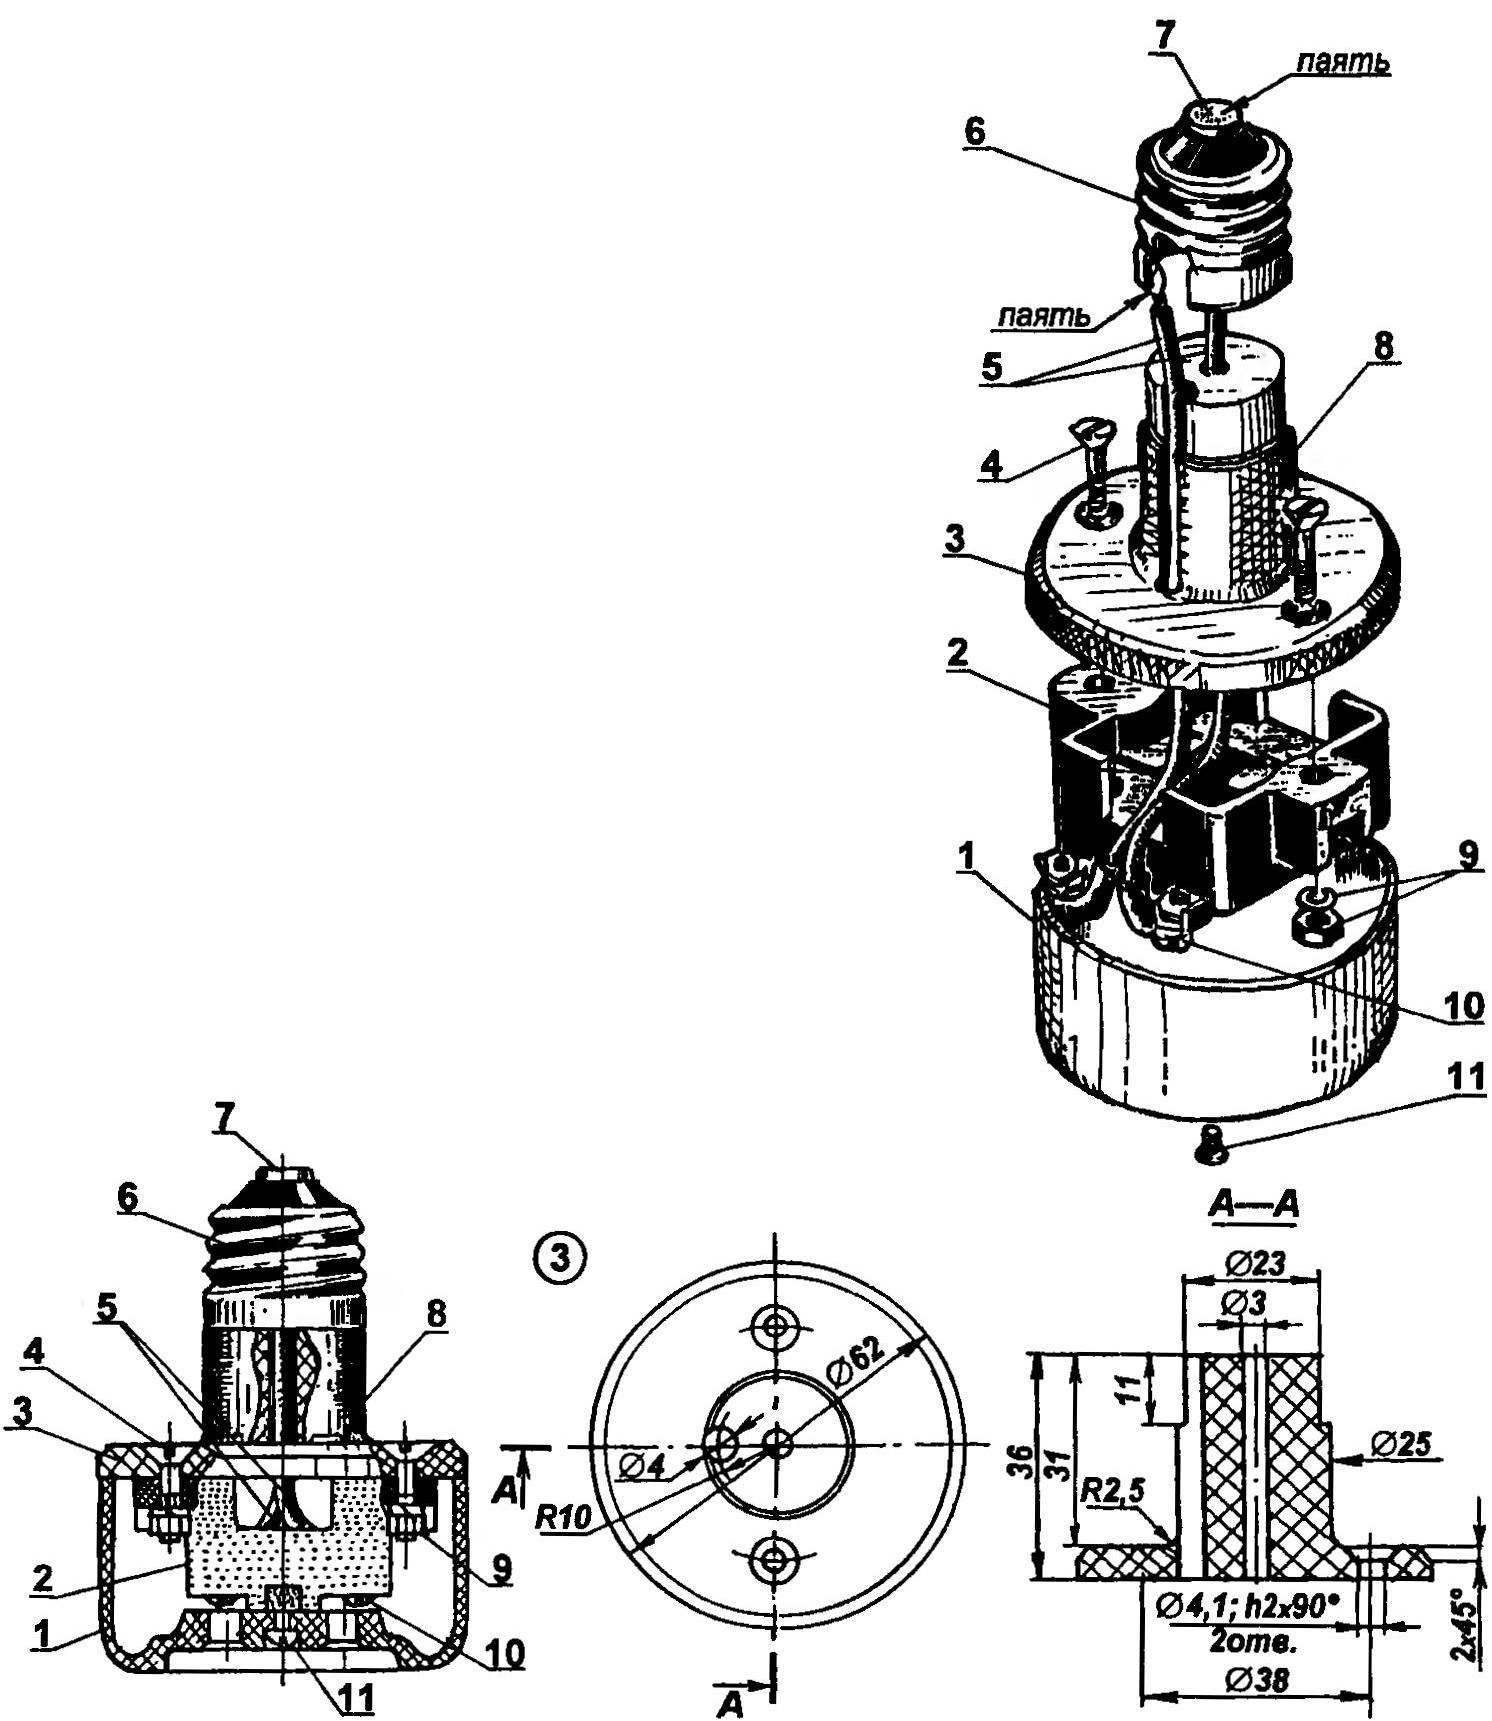 The Socket Where The Bulb